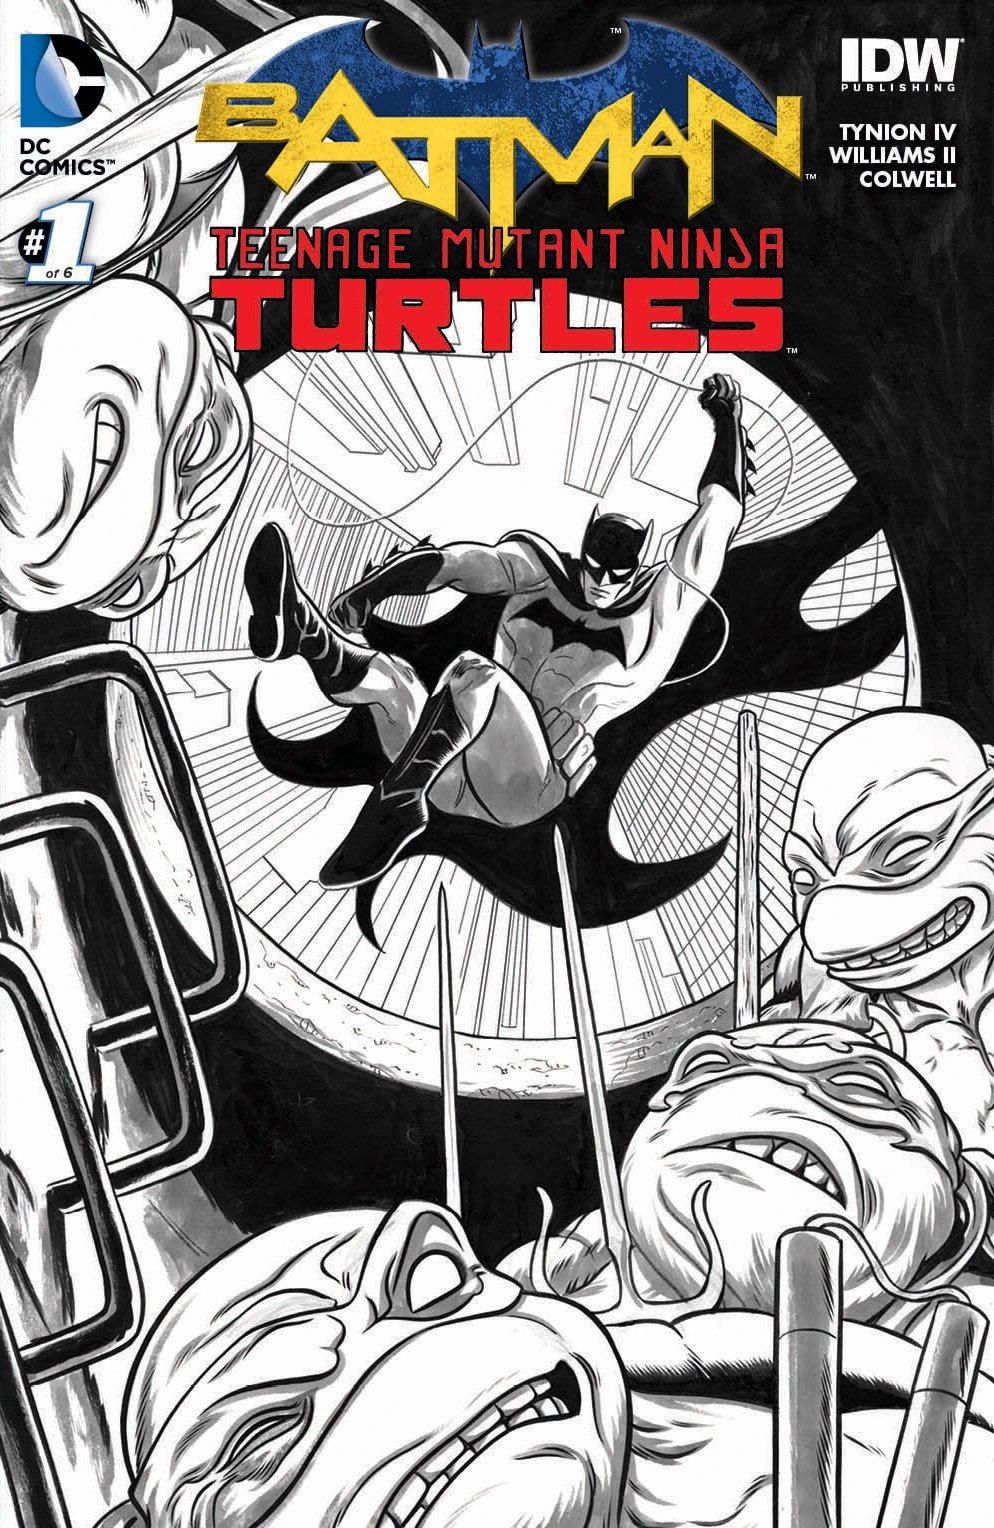 Batman Teenage Mutant Ninja Turtles #1 Newbury Comics Mike ...